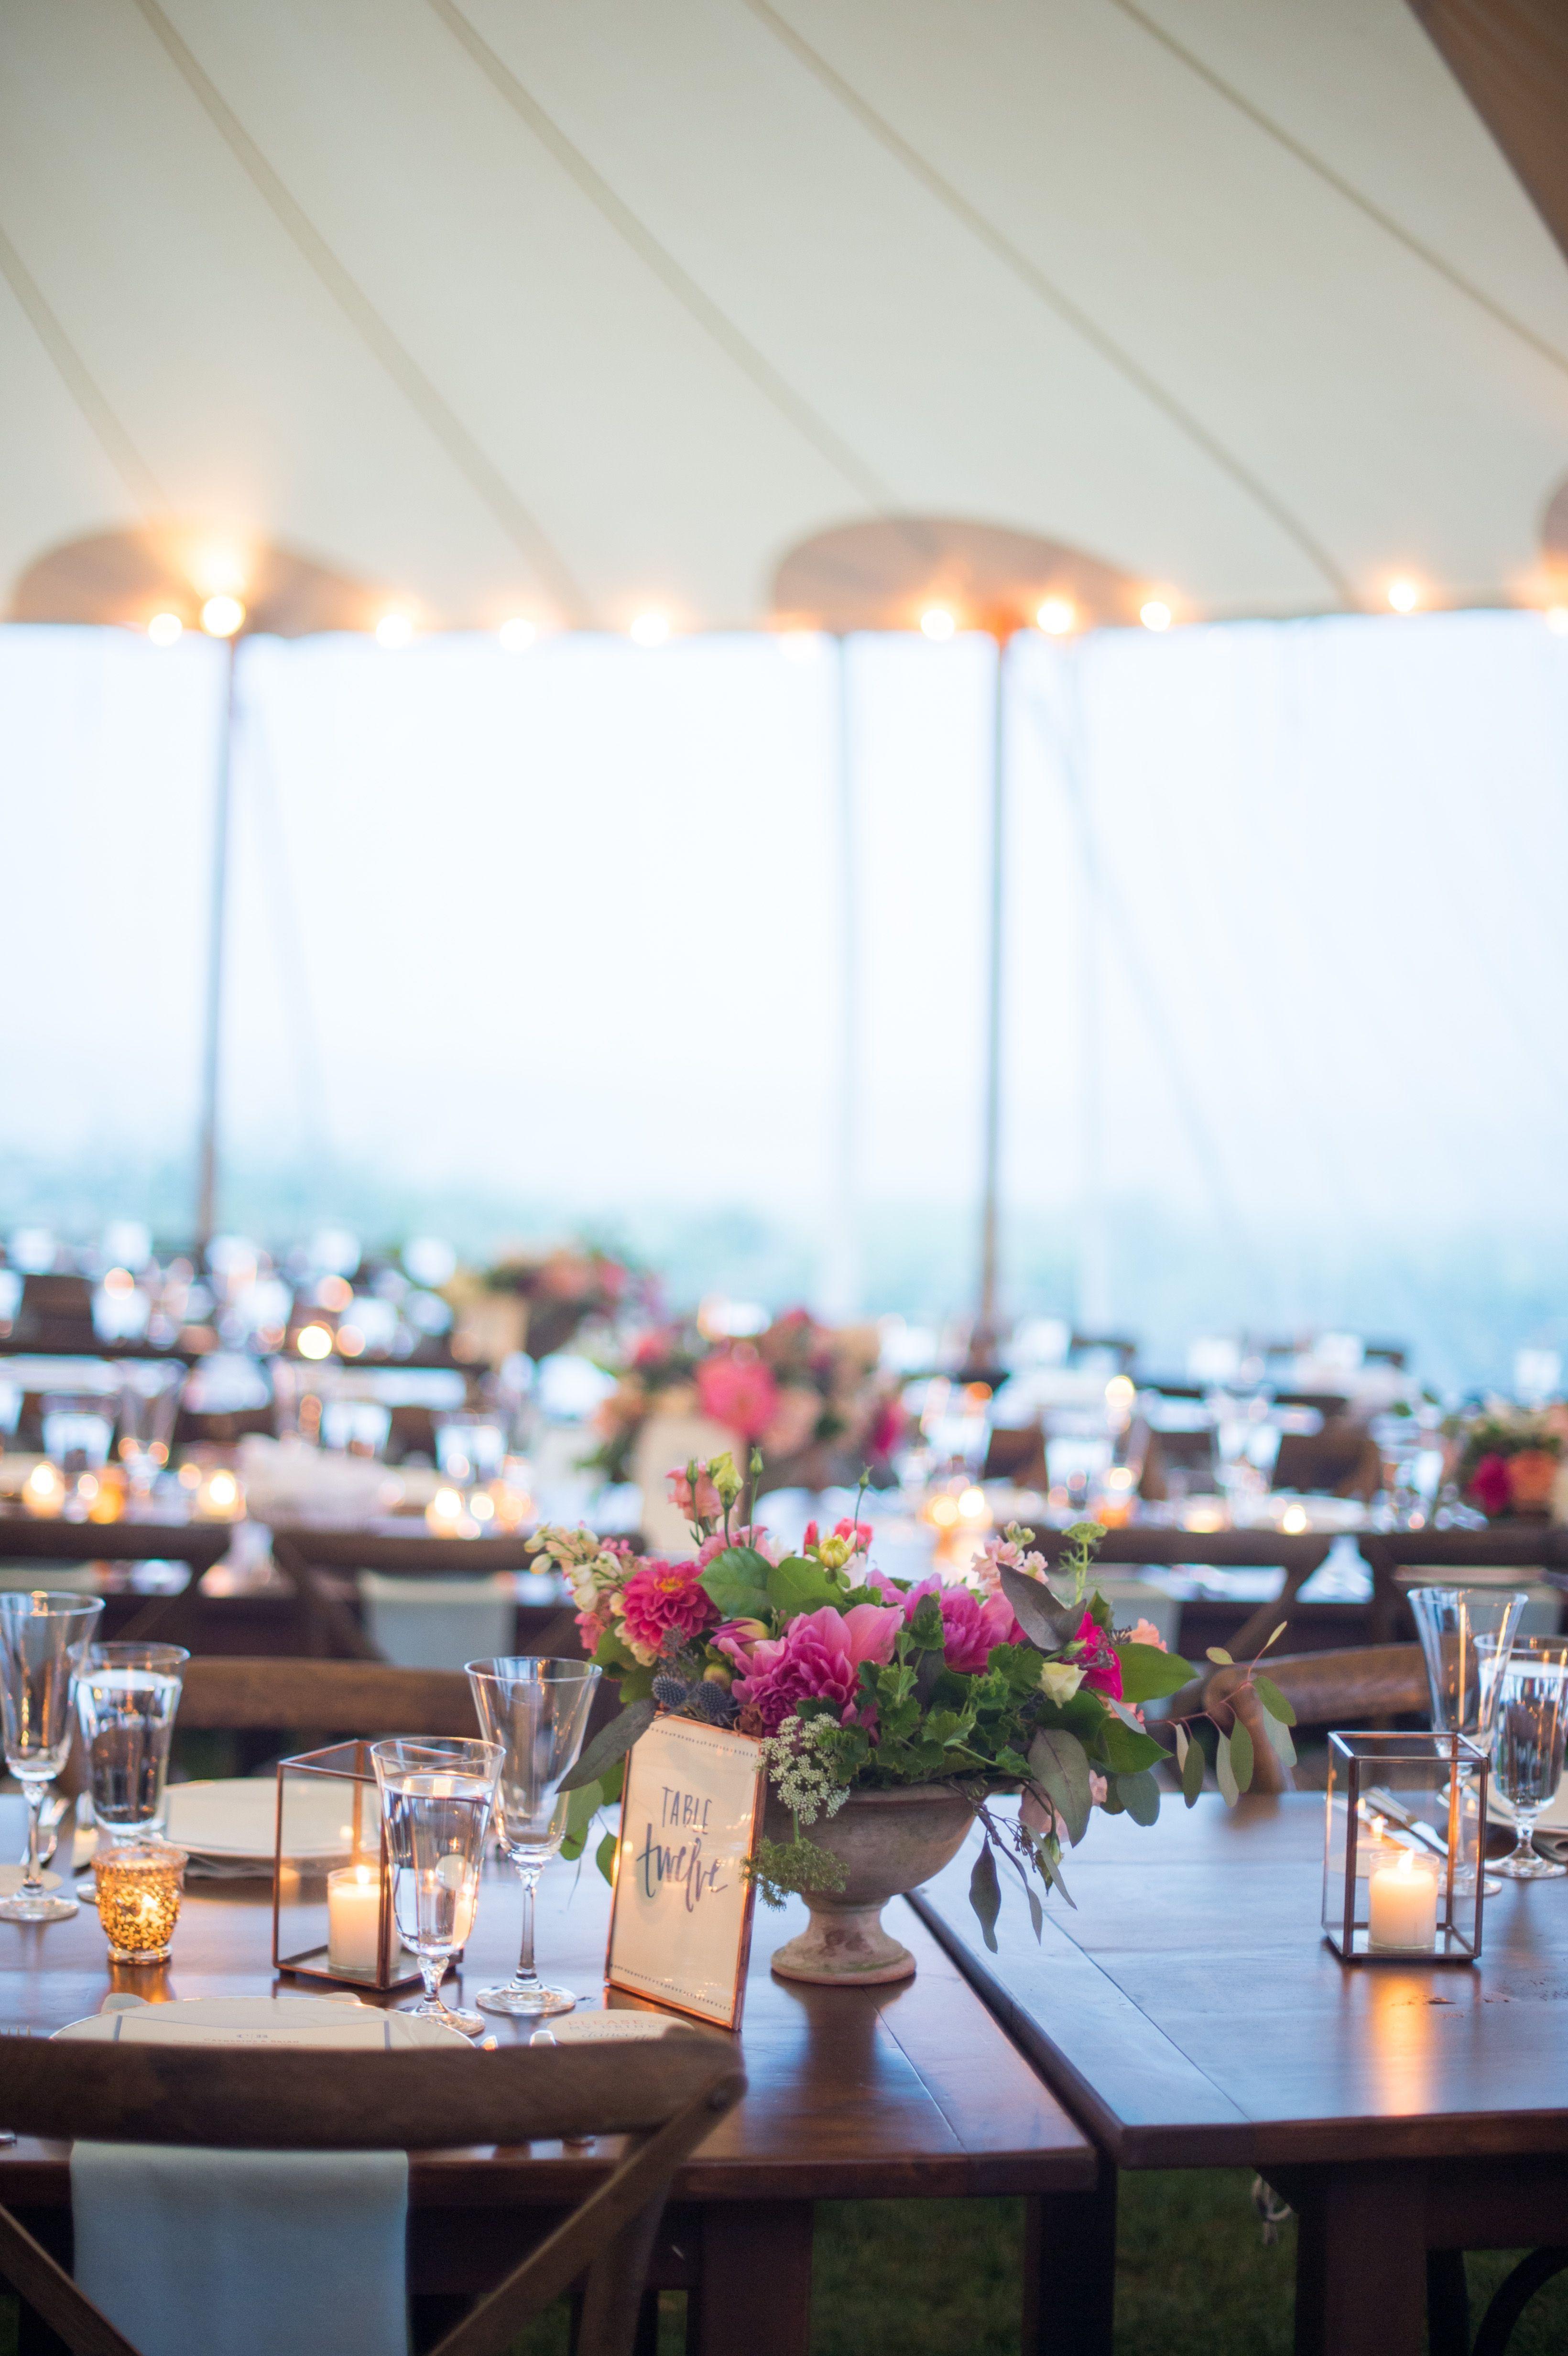 Wedding decorations tent october 2018 brea McDonald photography Kennebunk Maine Wedding Tented Wedding